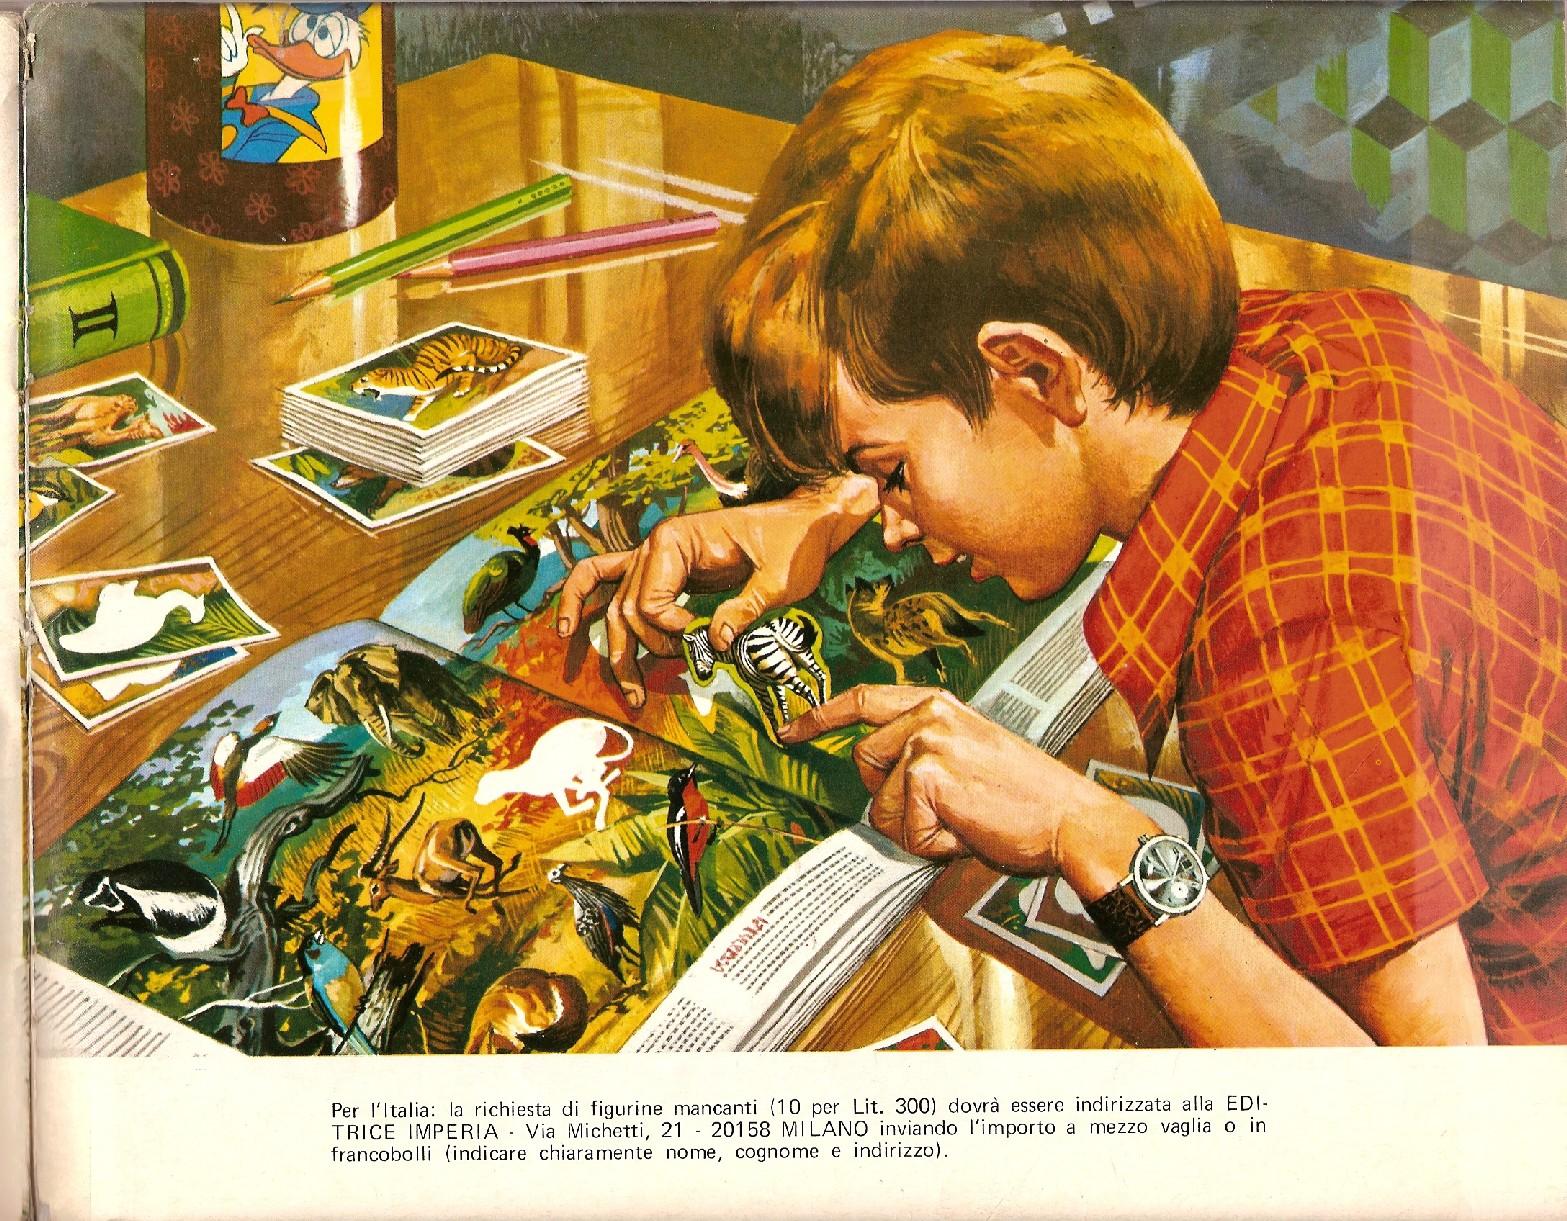 OLYMPIA 1896-1972-PANINI-Figurina n.80-B Riproduzione francobollo Rec